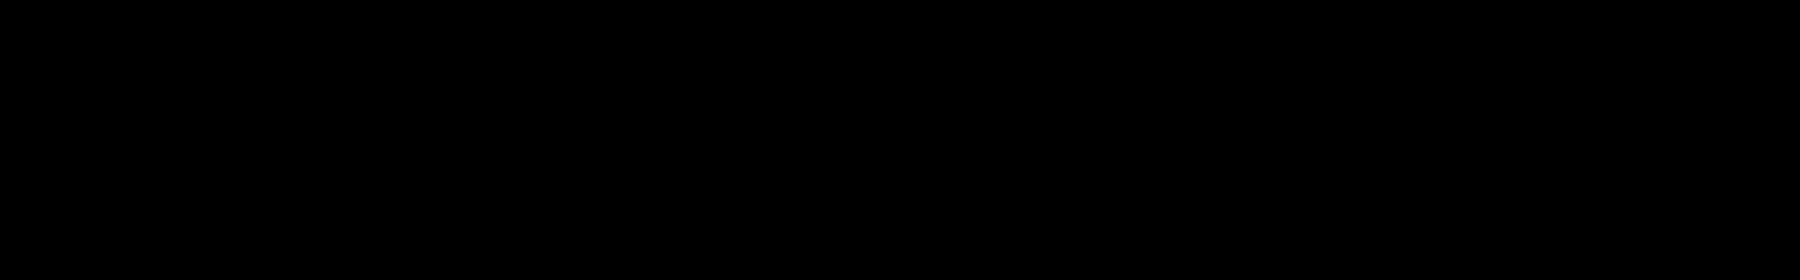 Vox Engine 2 audio waveform